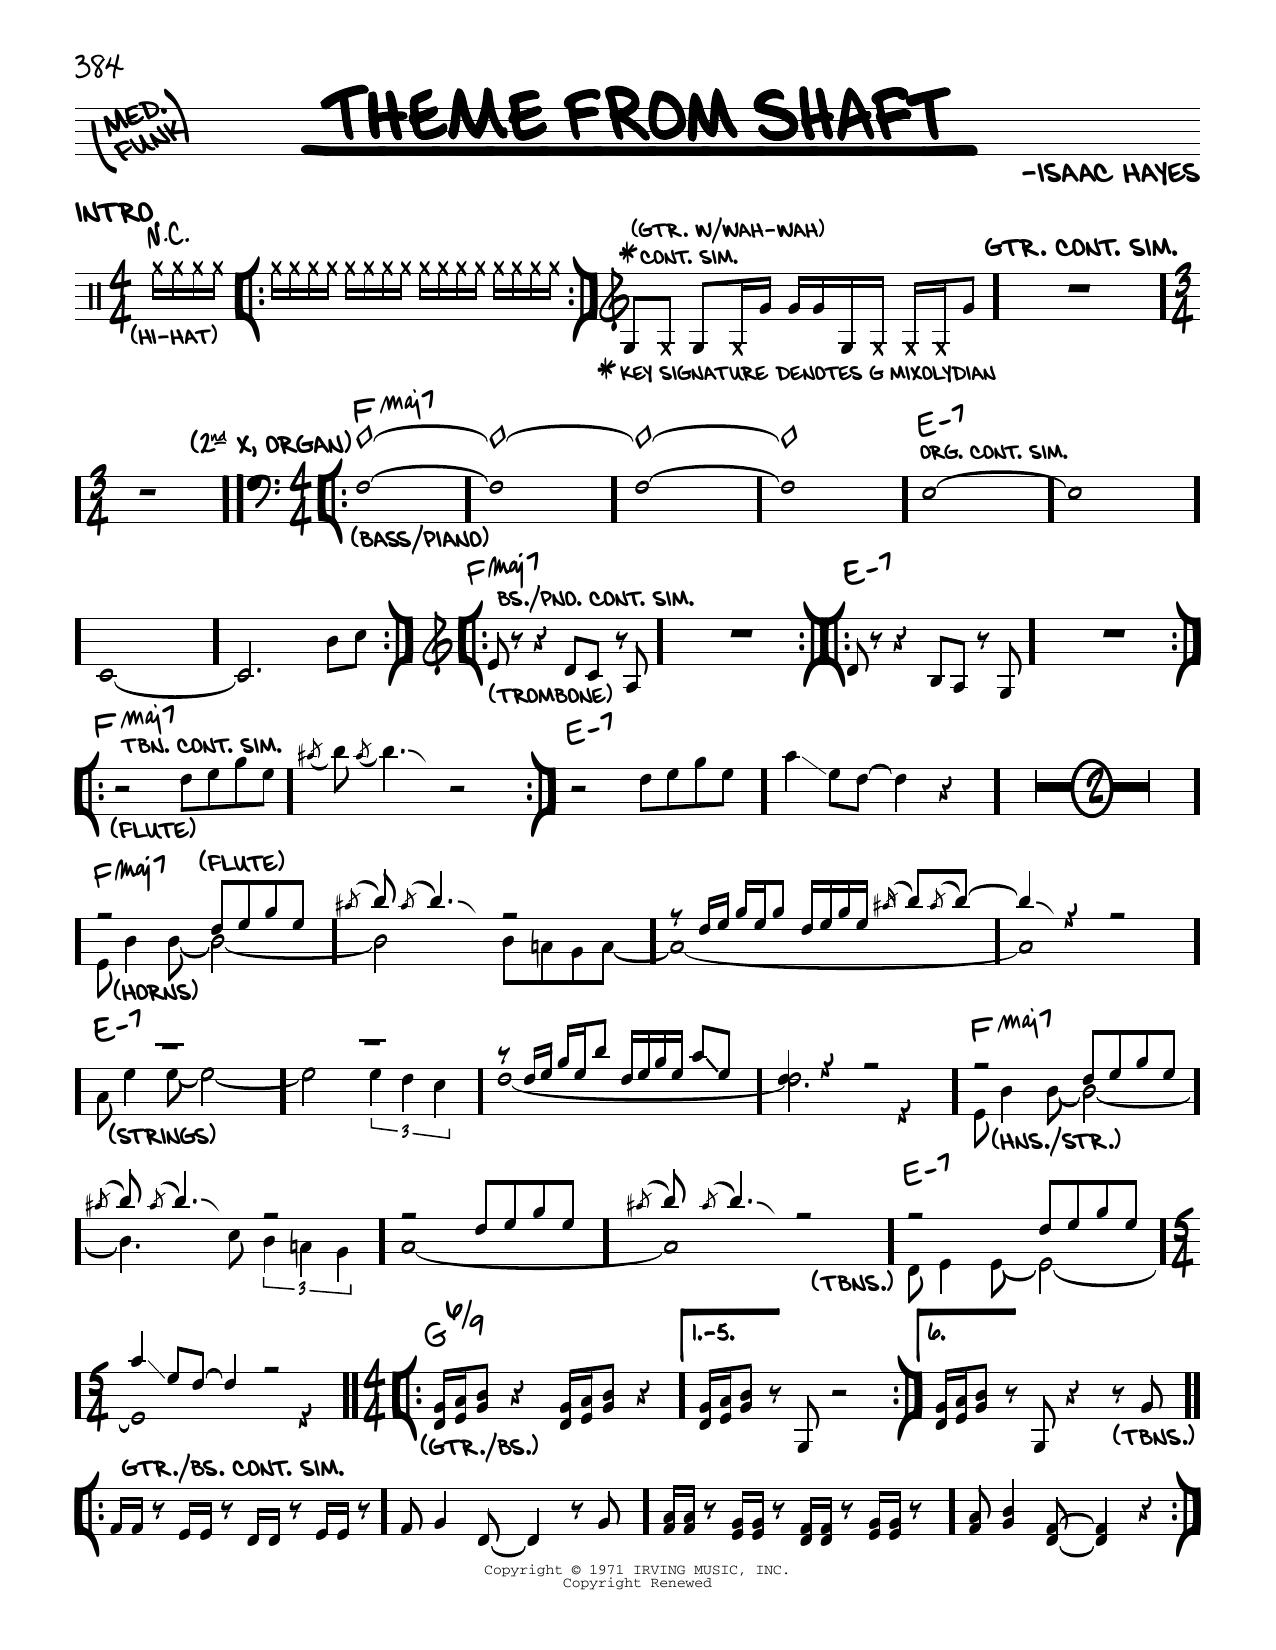 Theme From Shaft sheet music